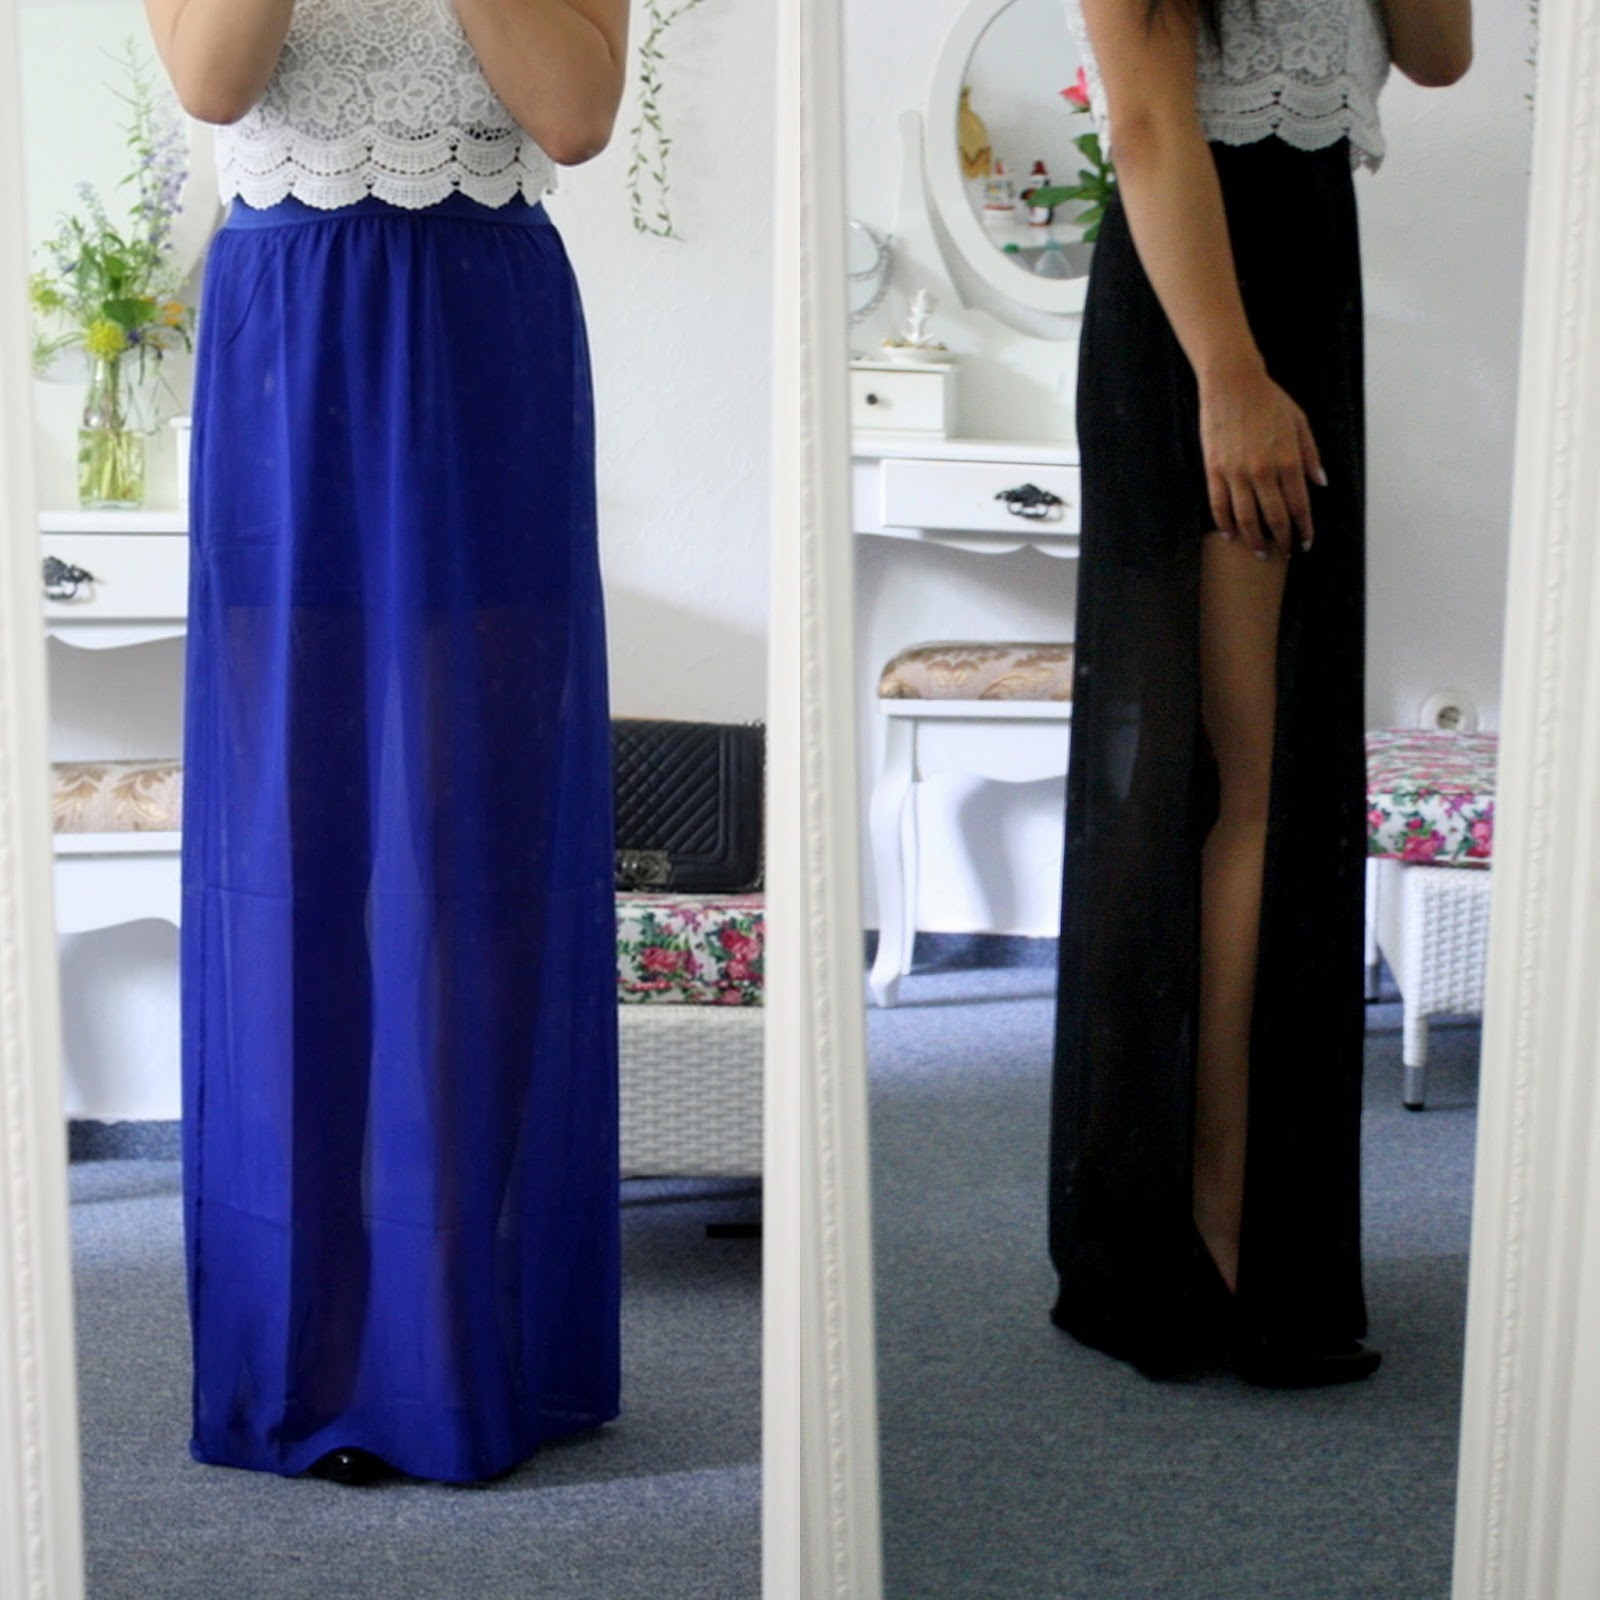 Maxi split skirt - H&M *direct link* 9.99,-